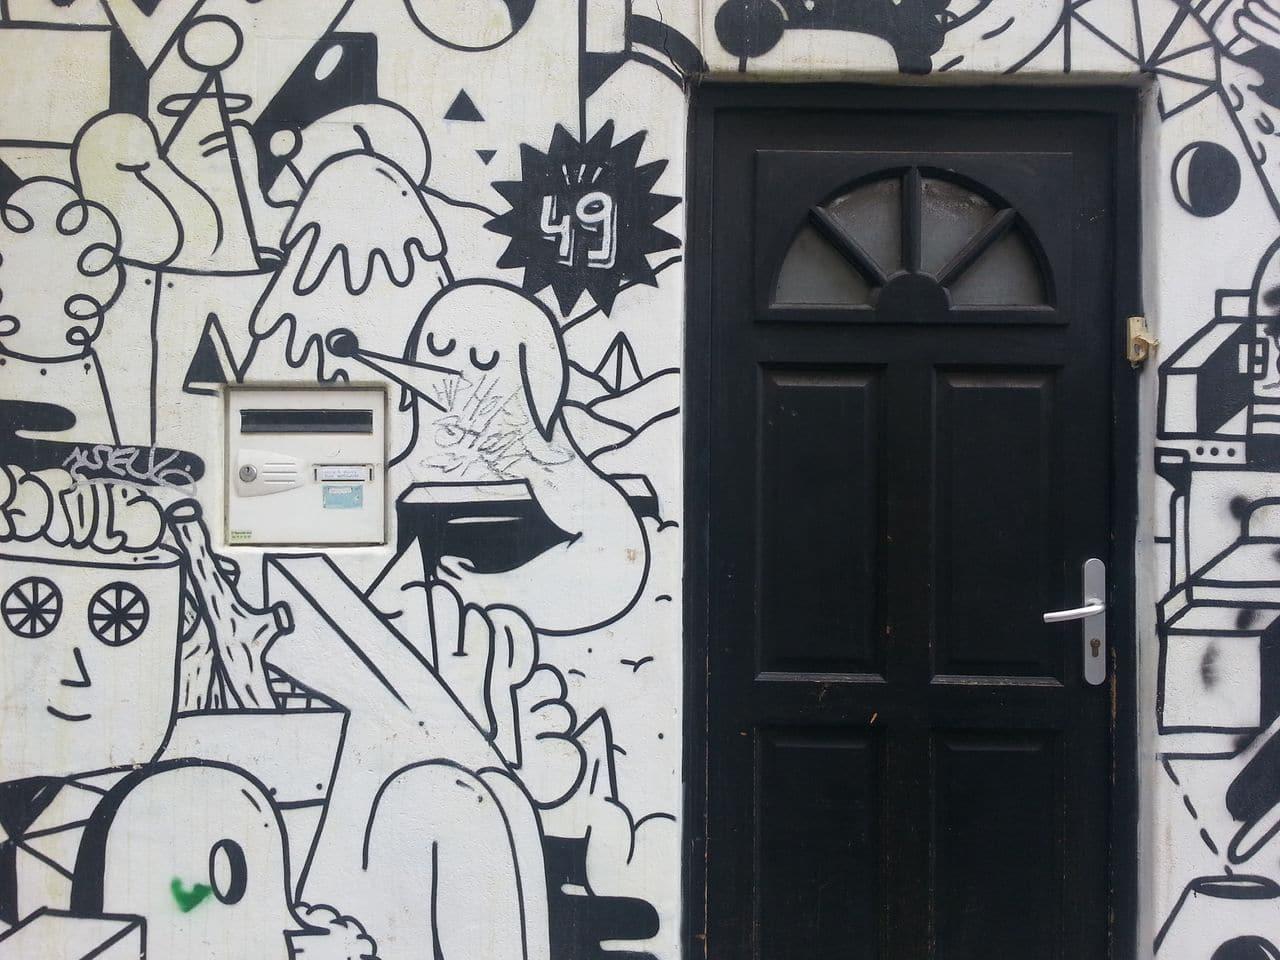 croix rousse street art maison graffiti